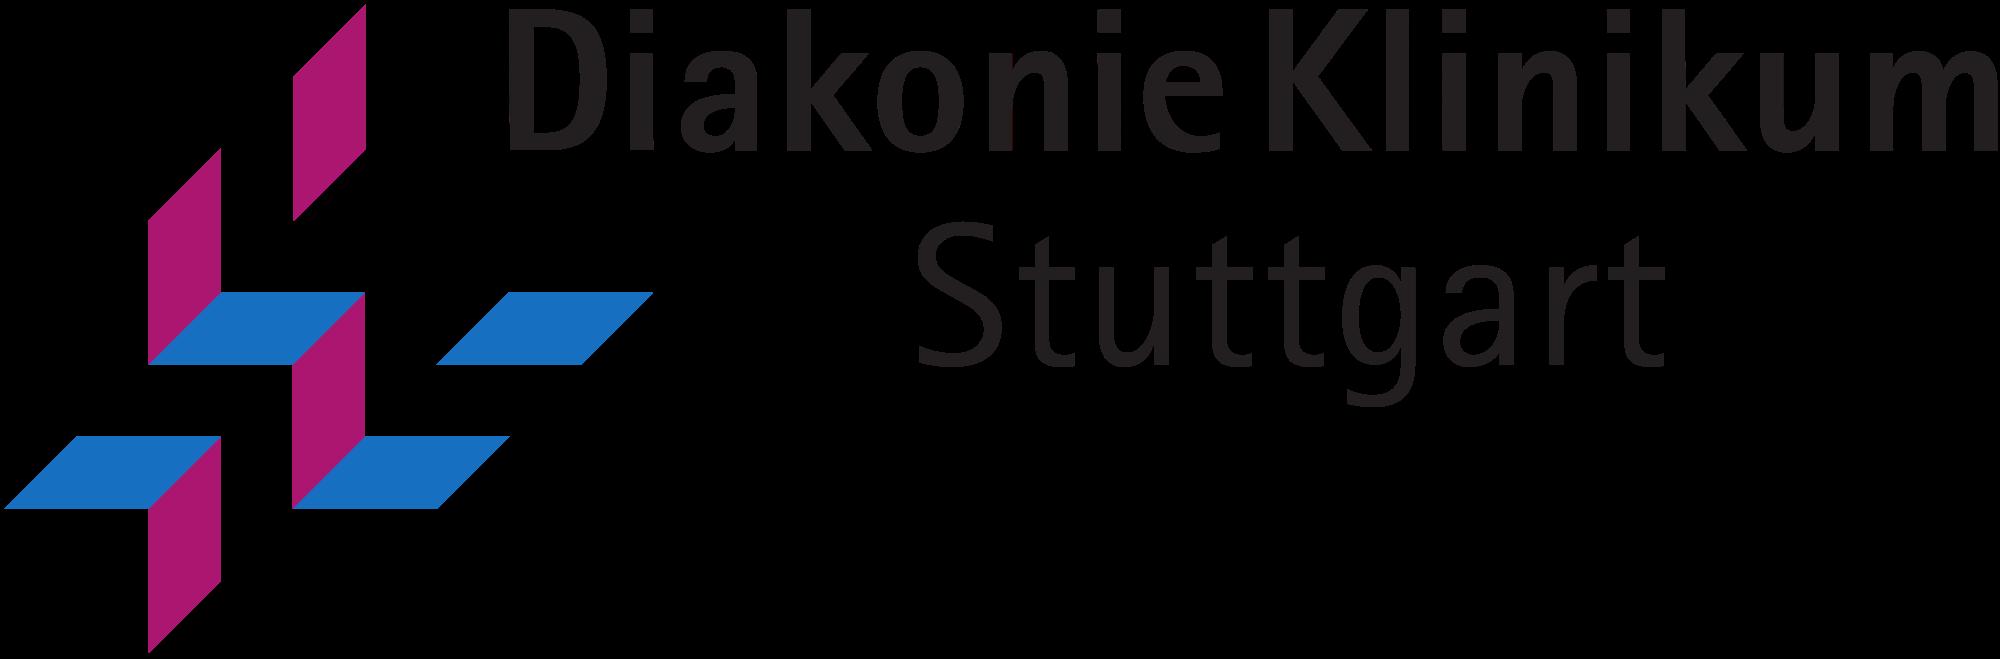 Diakonie Kliniken Stuttgart